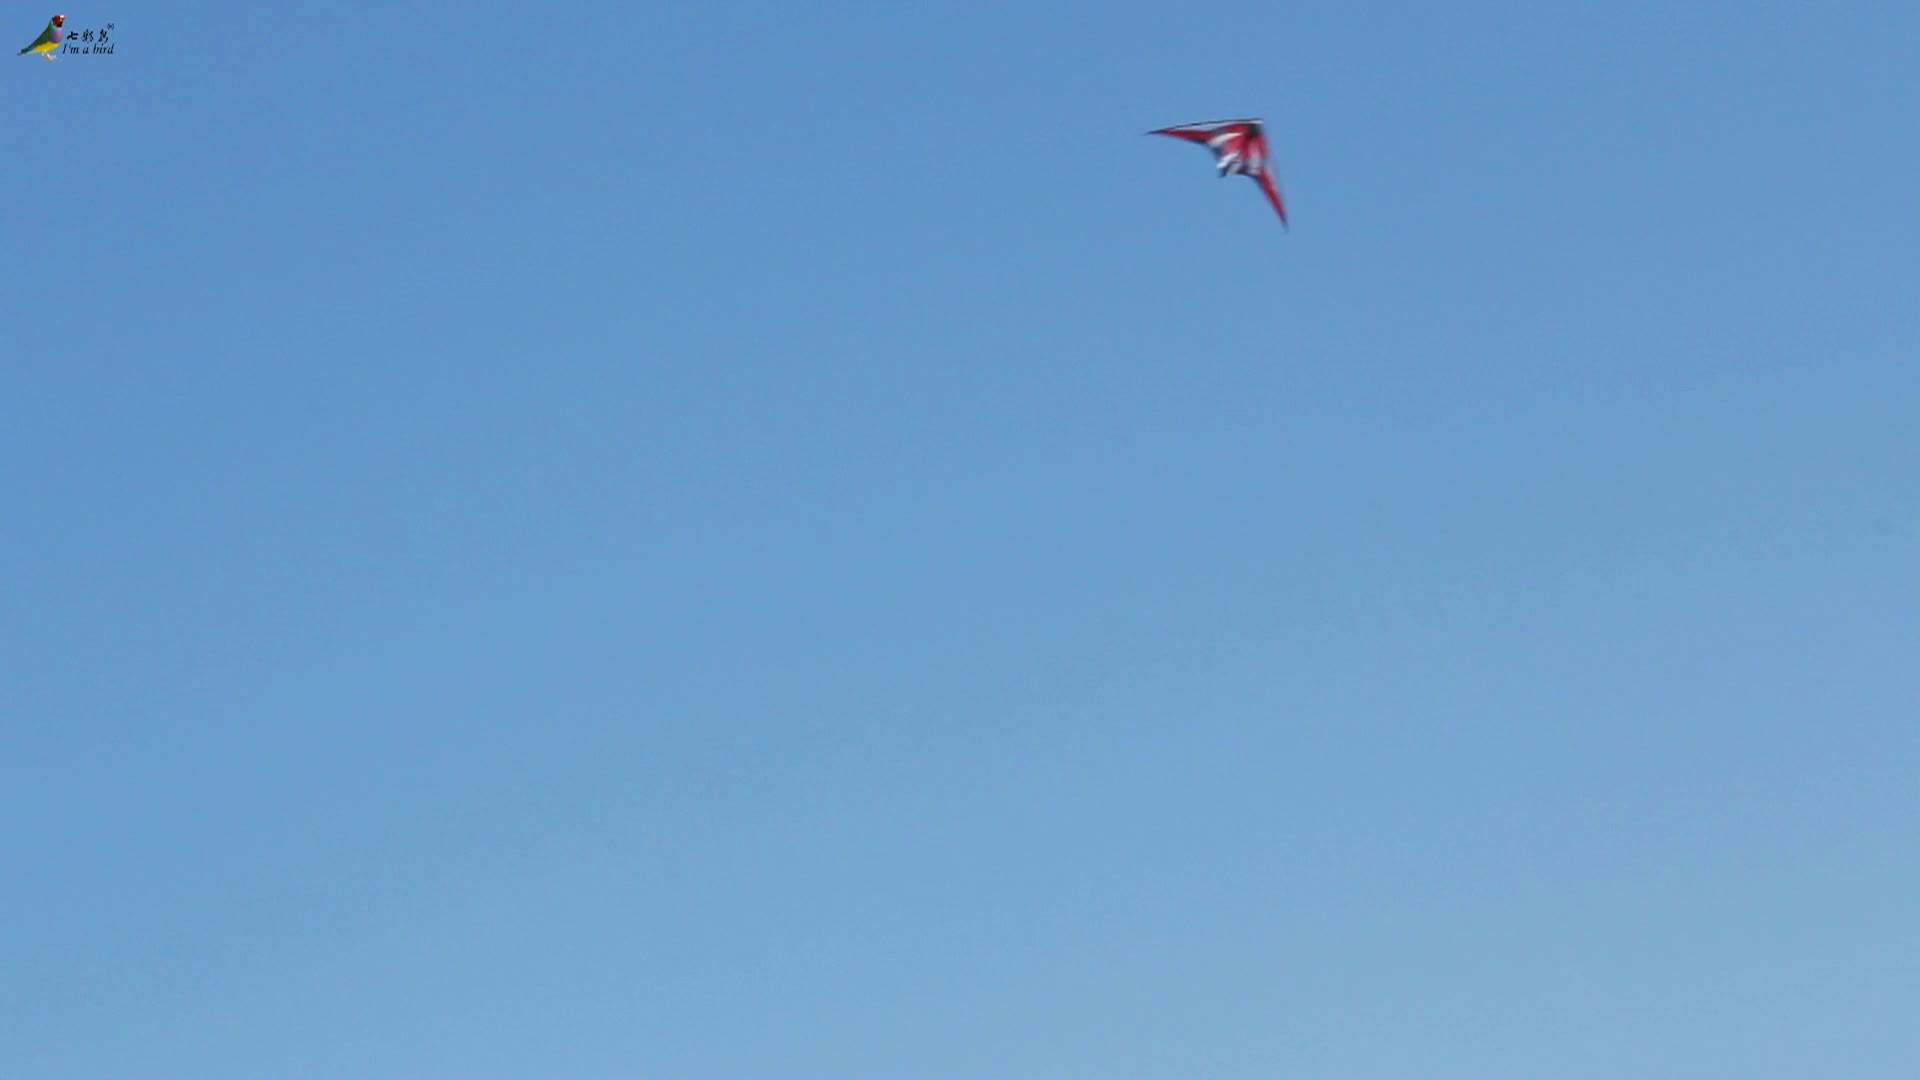 Atacado Outerdoor Esporte Novo 47 polegada Linha Dupla Stunt Papagaios Para Venda